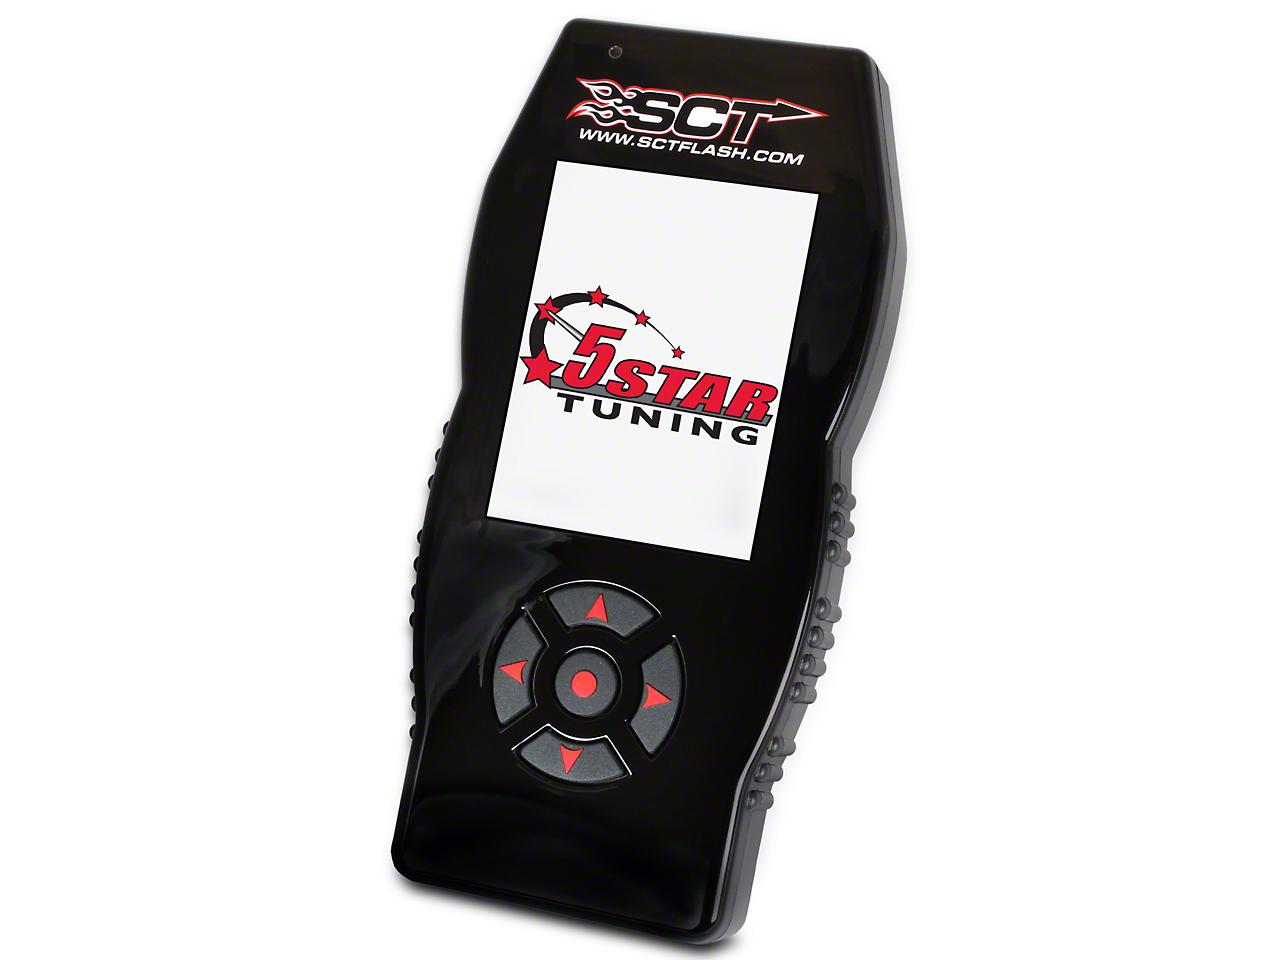 5 Star SF4/X4 Power Flash Tuner w/ 3 Custom Tunes (97-03 5.4L F-150, Excluding Lightning & 02-03 Harley Davidson)